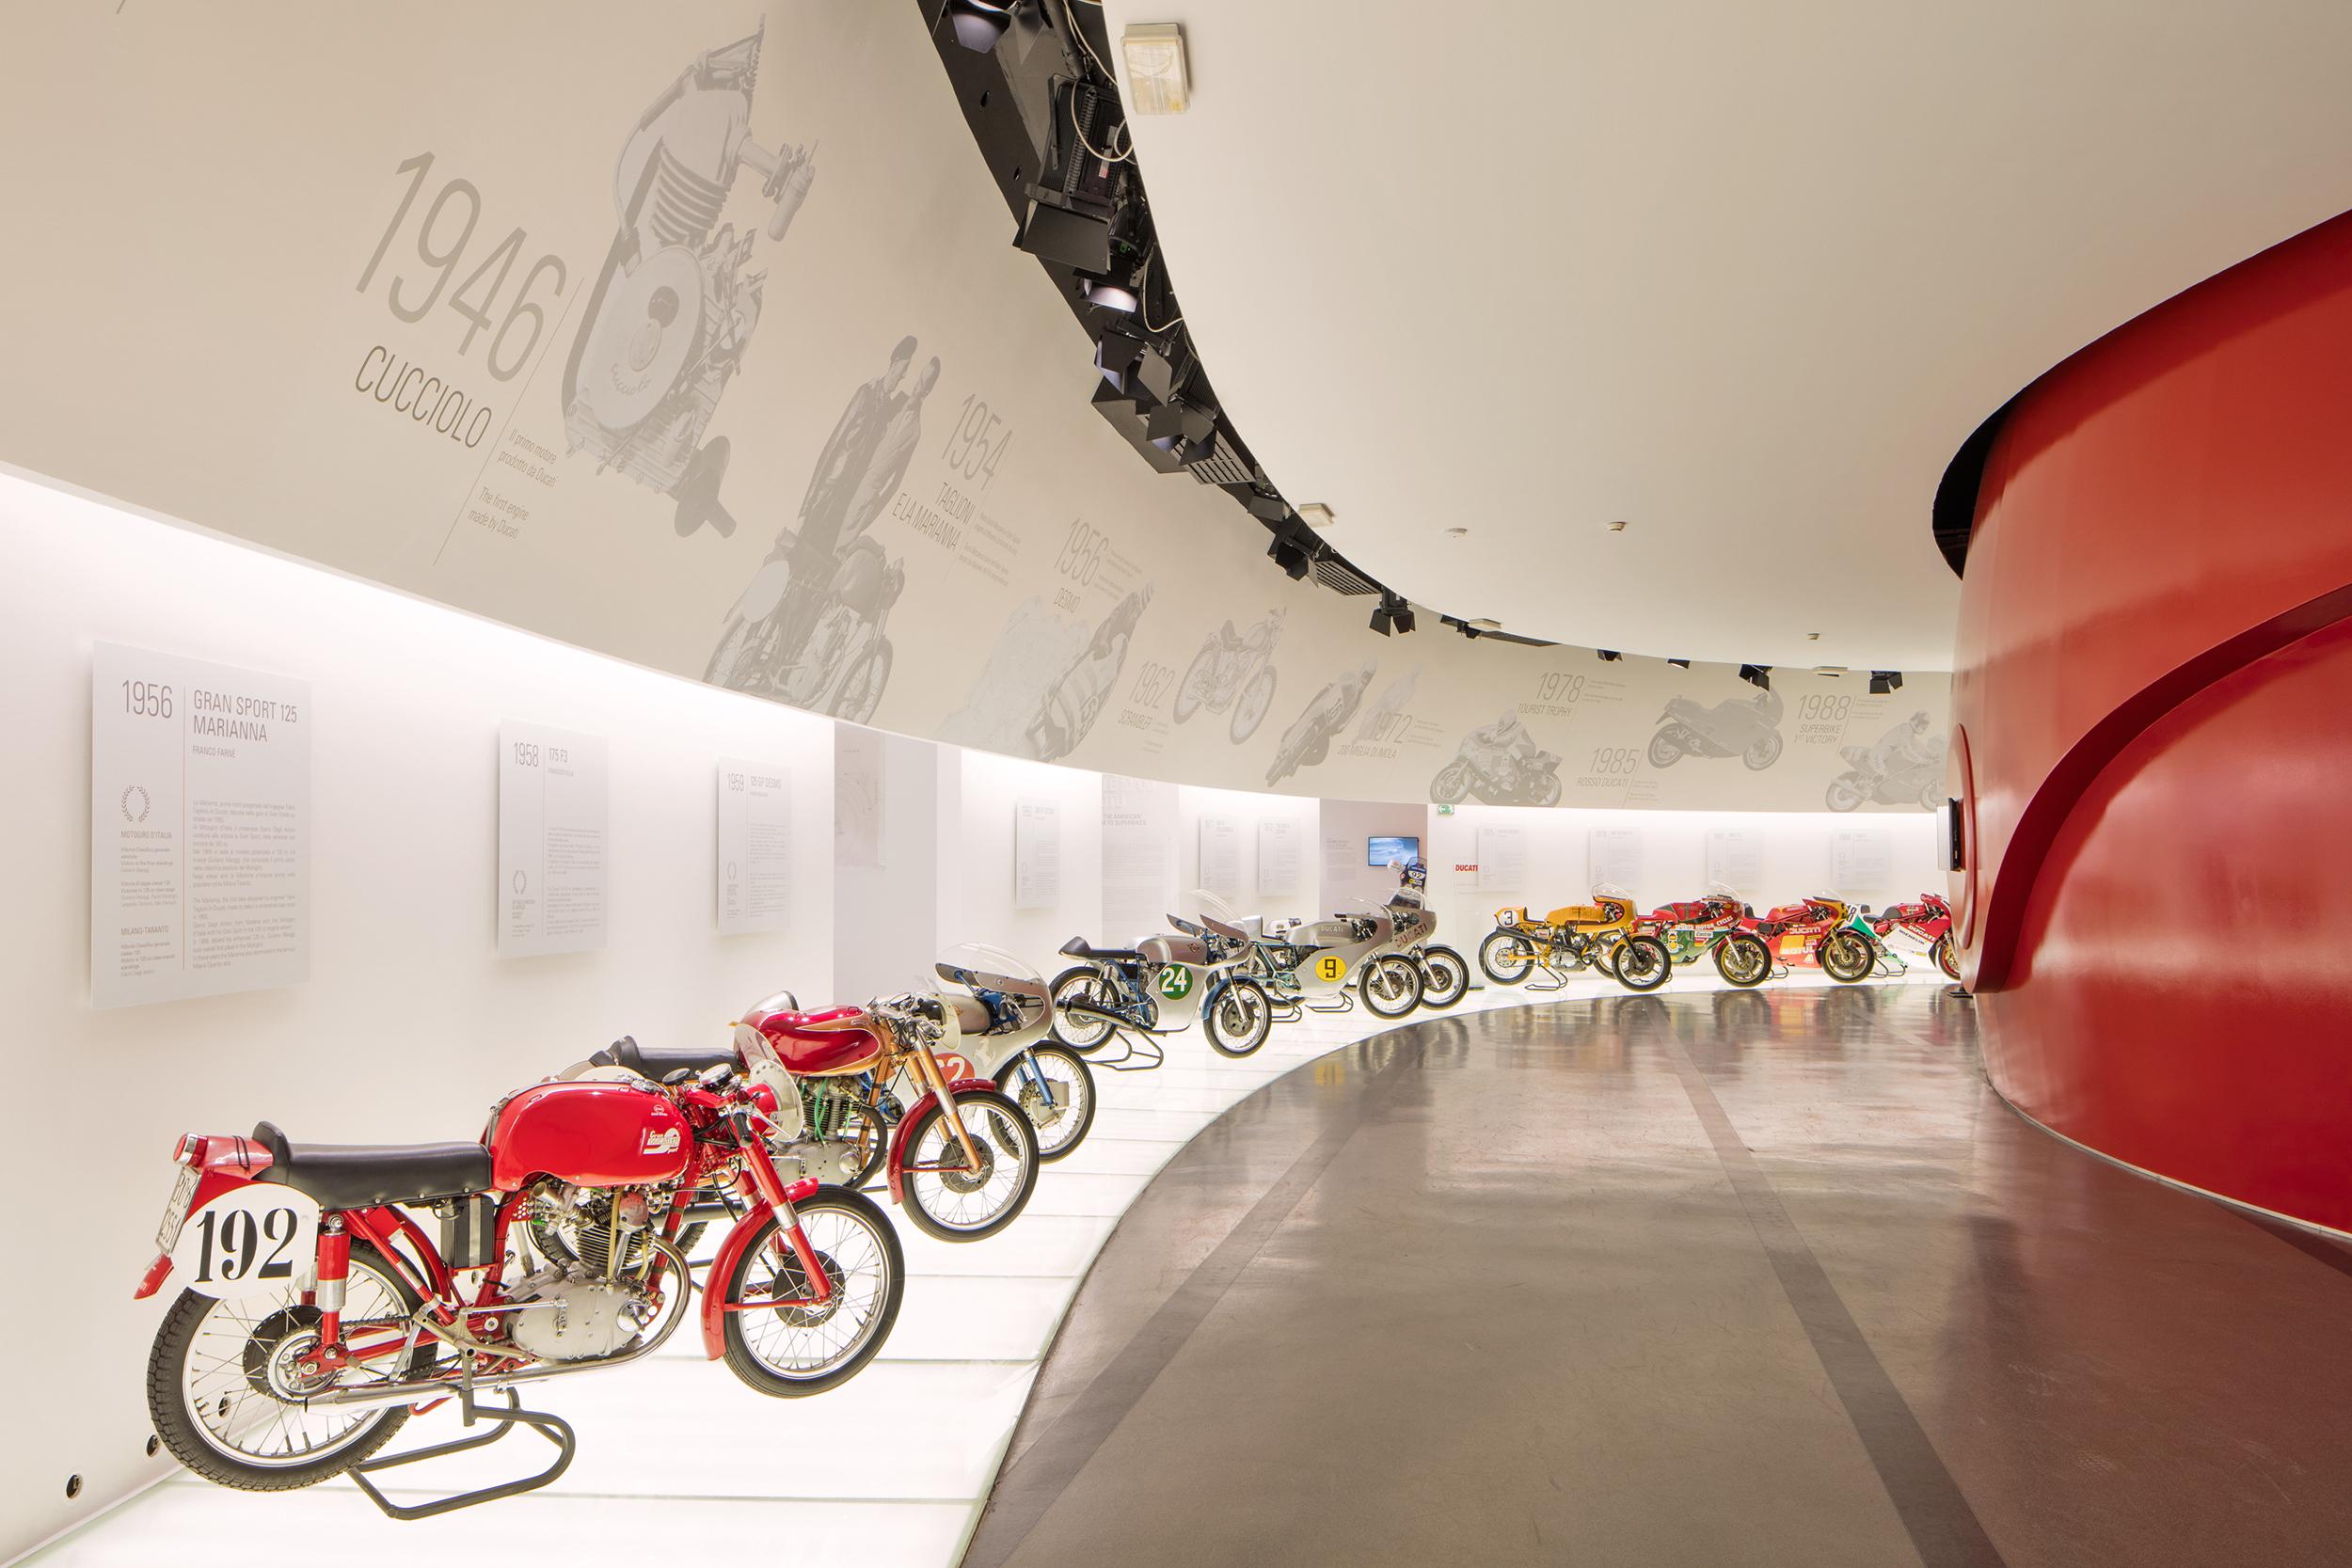 201002 Ducati Museum Racing Room_UC29151_High